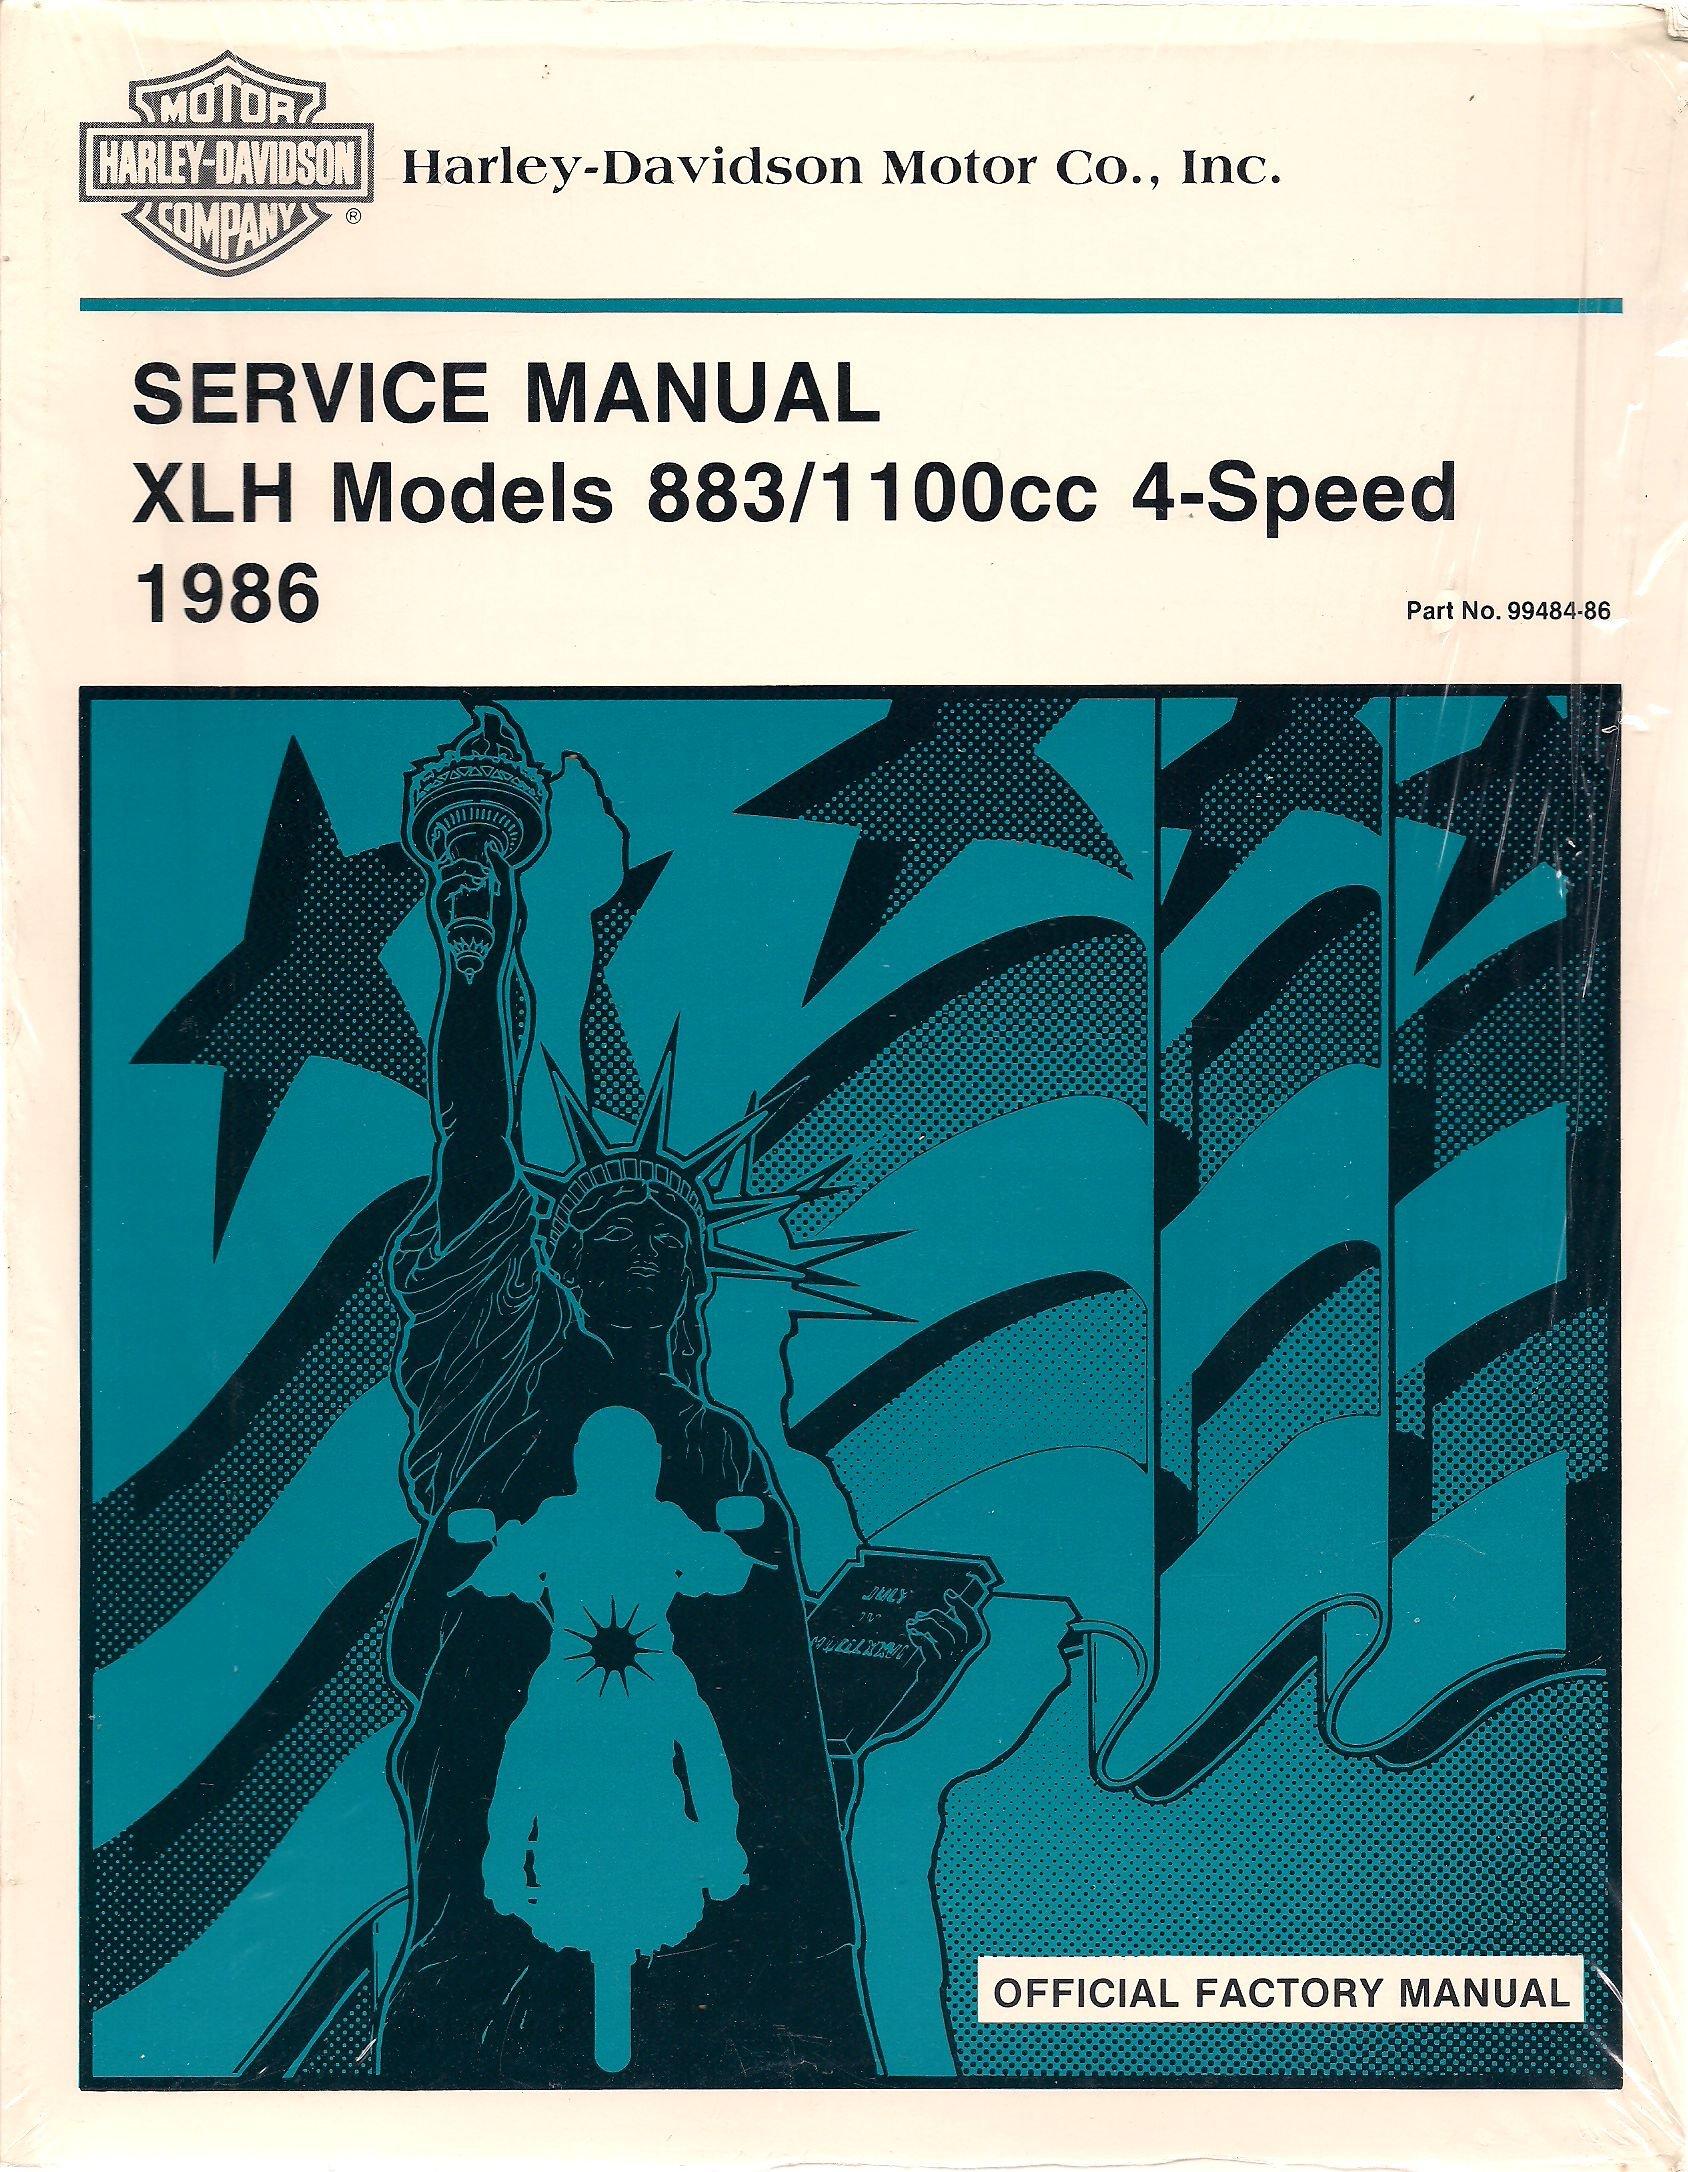 1986 Harley-Davidson XLH Models 883/1100cc 4-Speed Service Manual, Part  Number 99484-86: Inc. Harley-Davidson Motor Co.: Amazon.com: Books